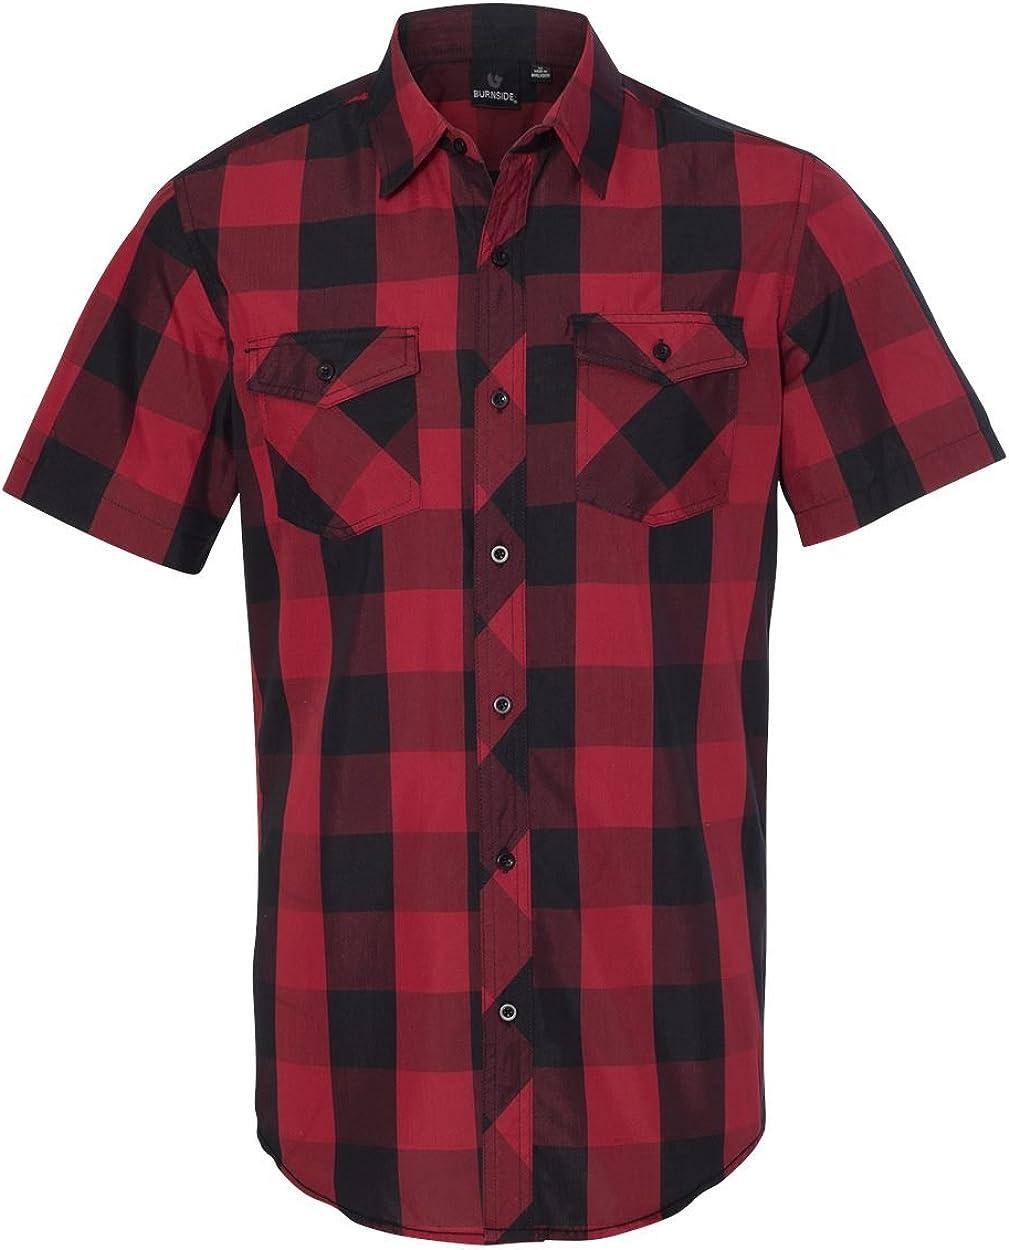 Burnside Buffalo Plaid Woven Shirt (B9203): Burnside: Clothing